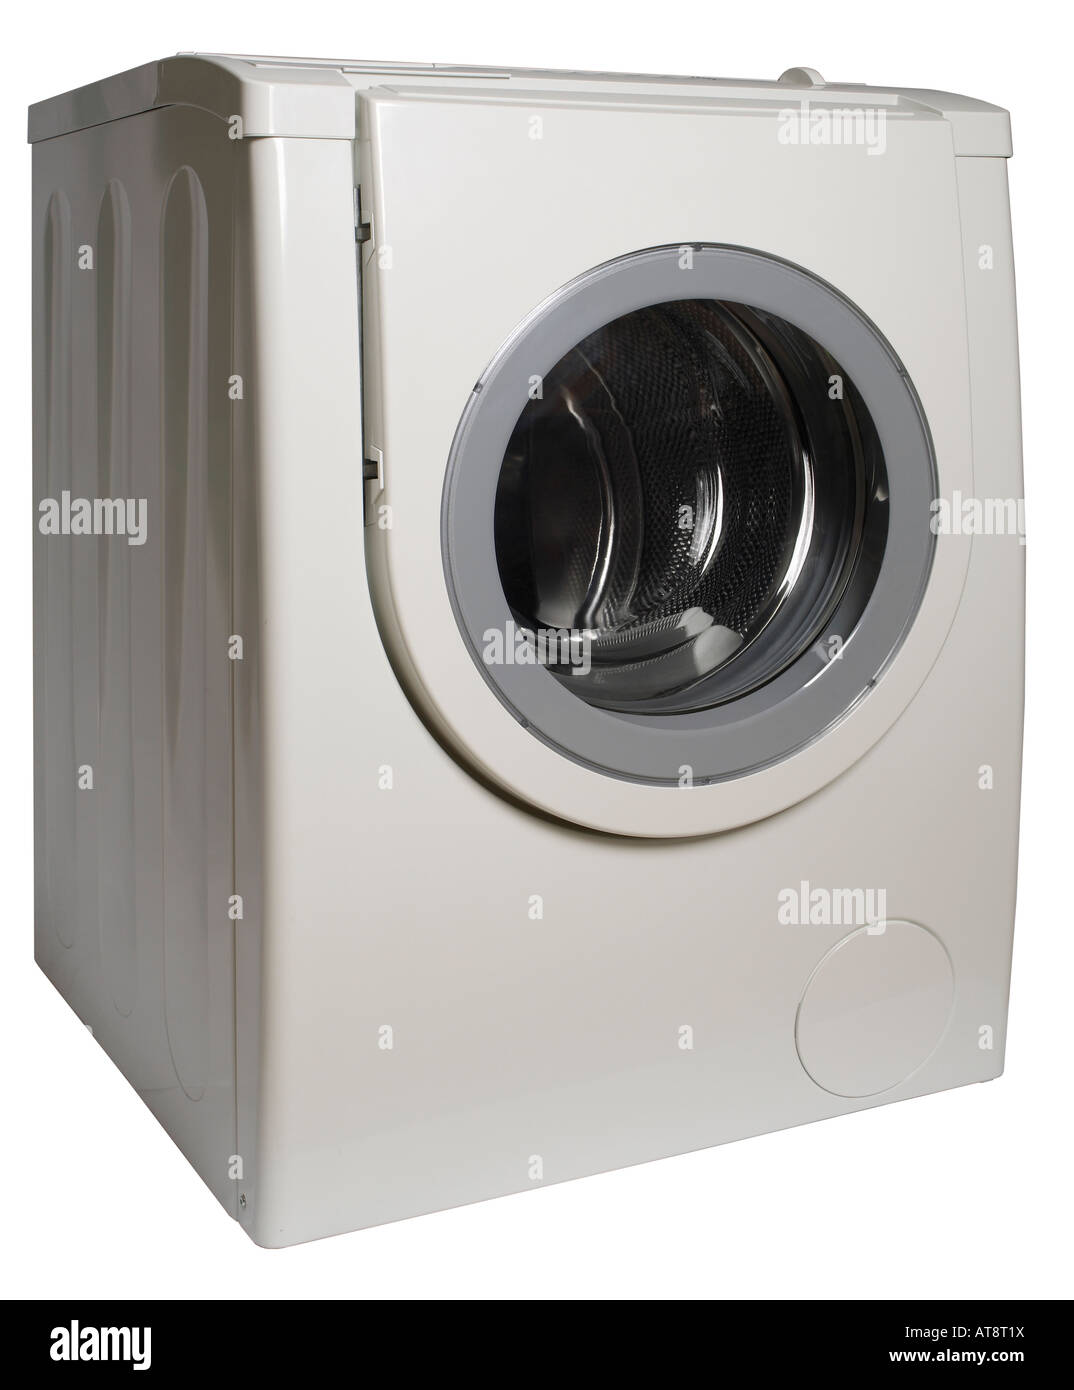 spin dryer stock photos spin dryer stock images alamy. Black Bedroom Furniture Sets. Home Design Ideas